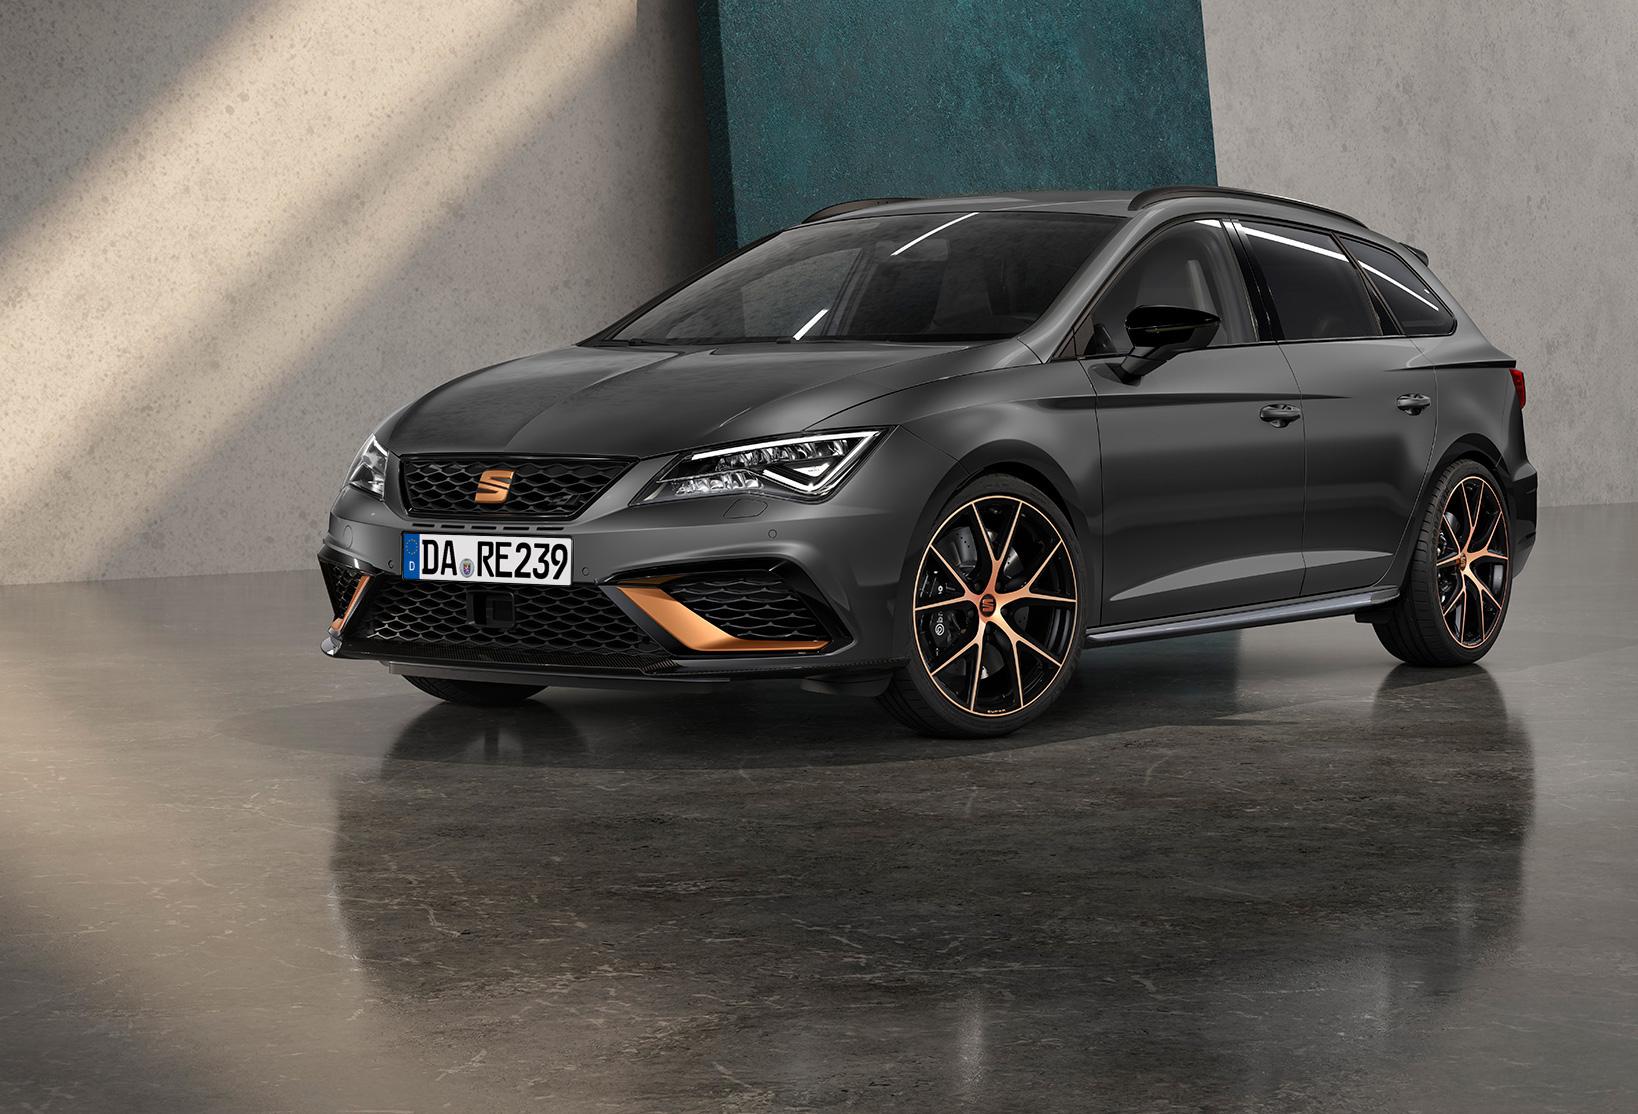 [Privatleasing] Seat Leon ST Cupra R (300PS) für monatl. 257€, LF 0,51/GF 0,58